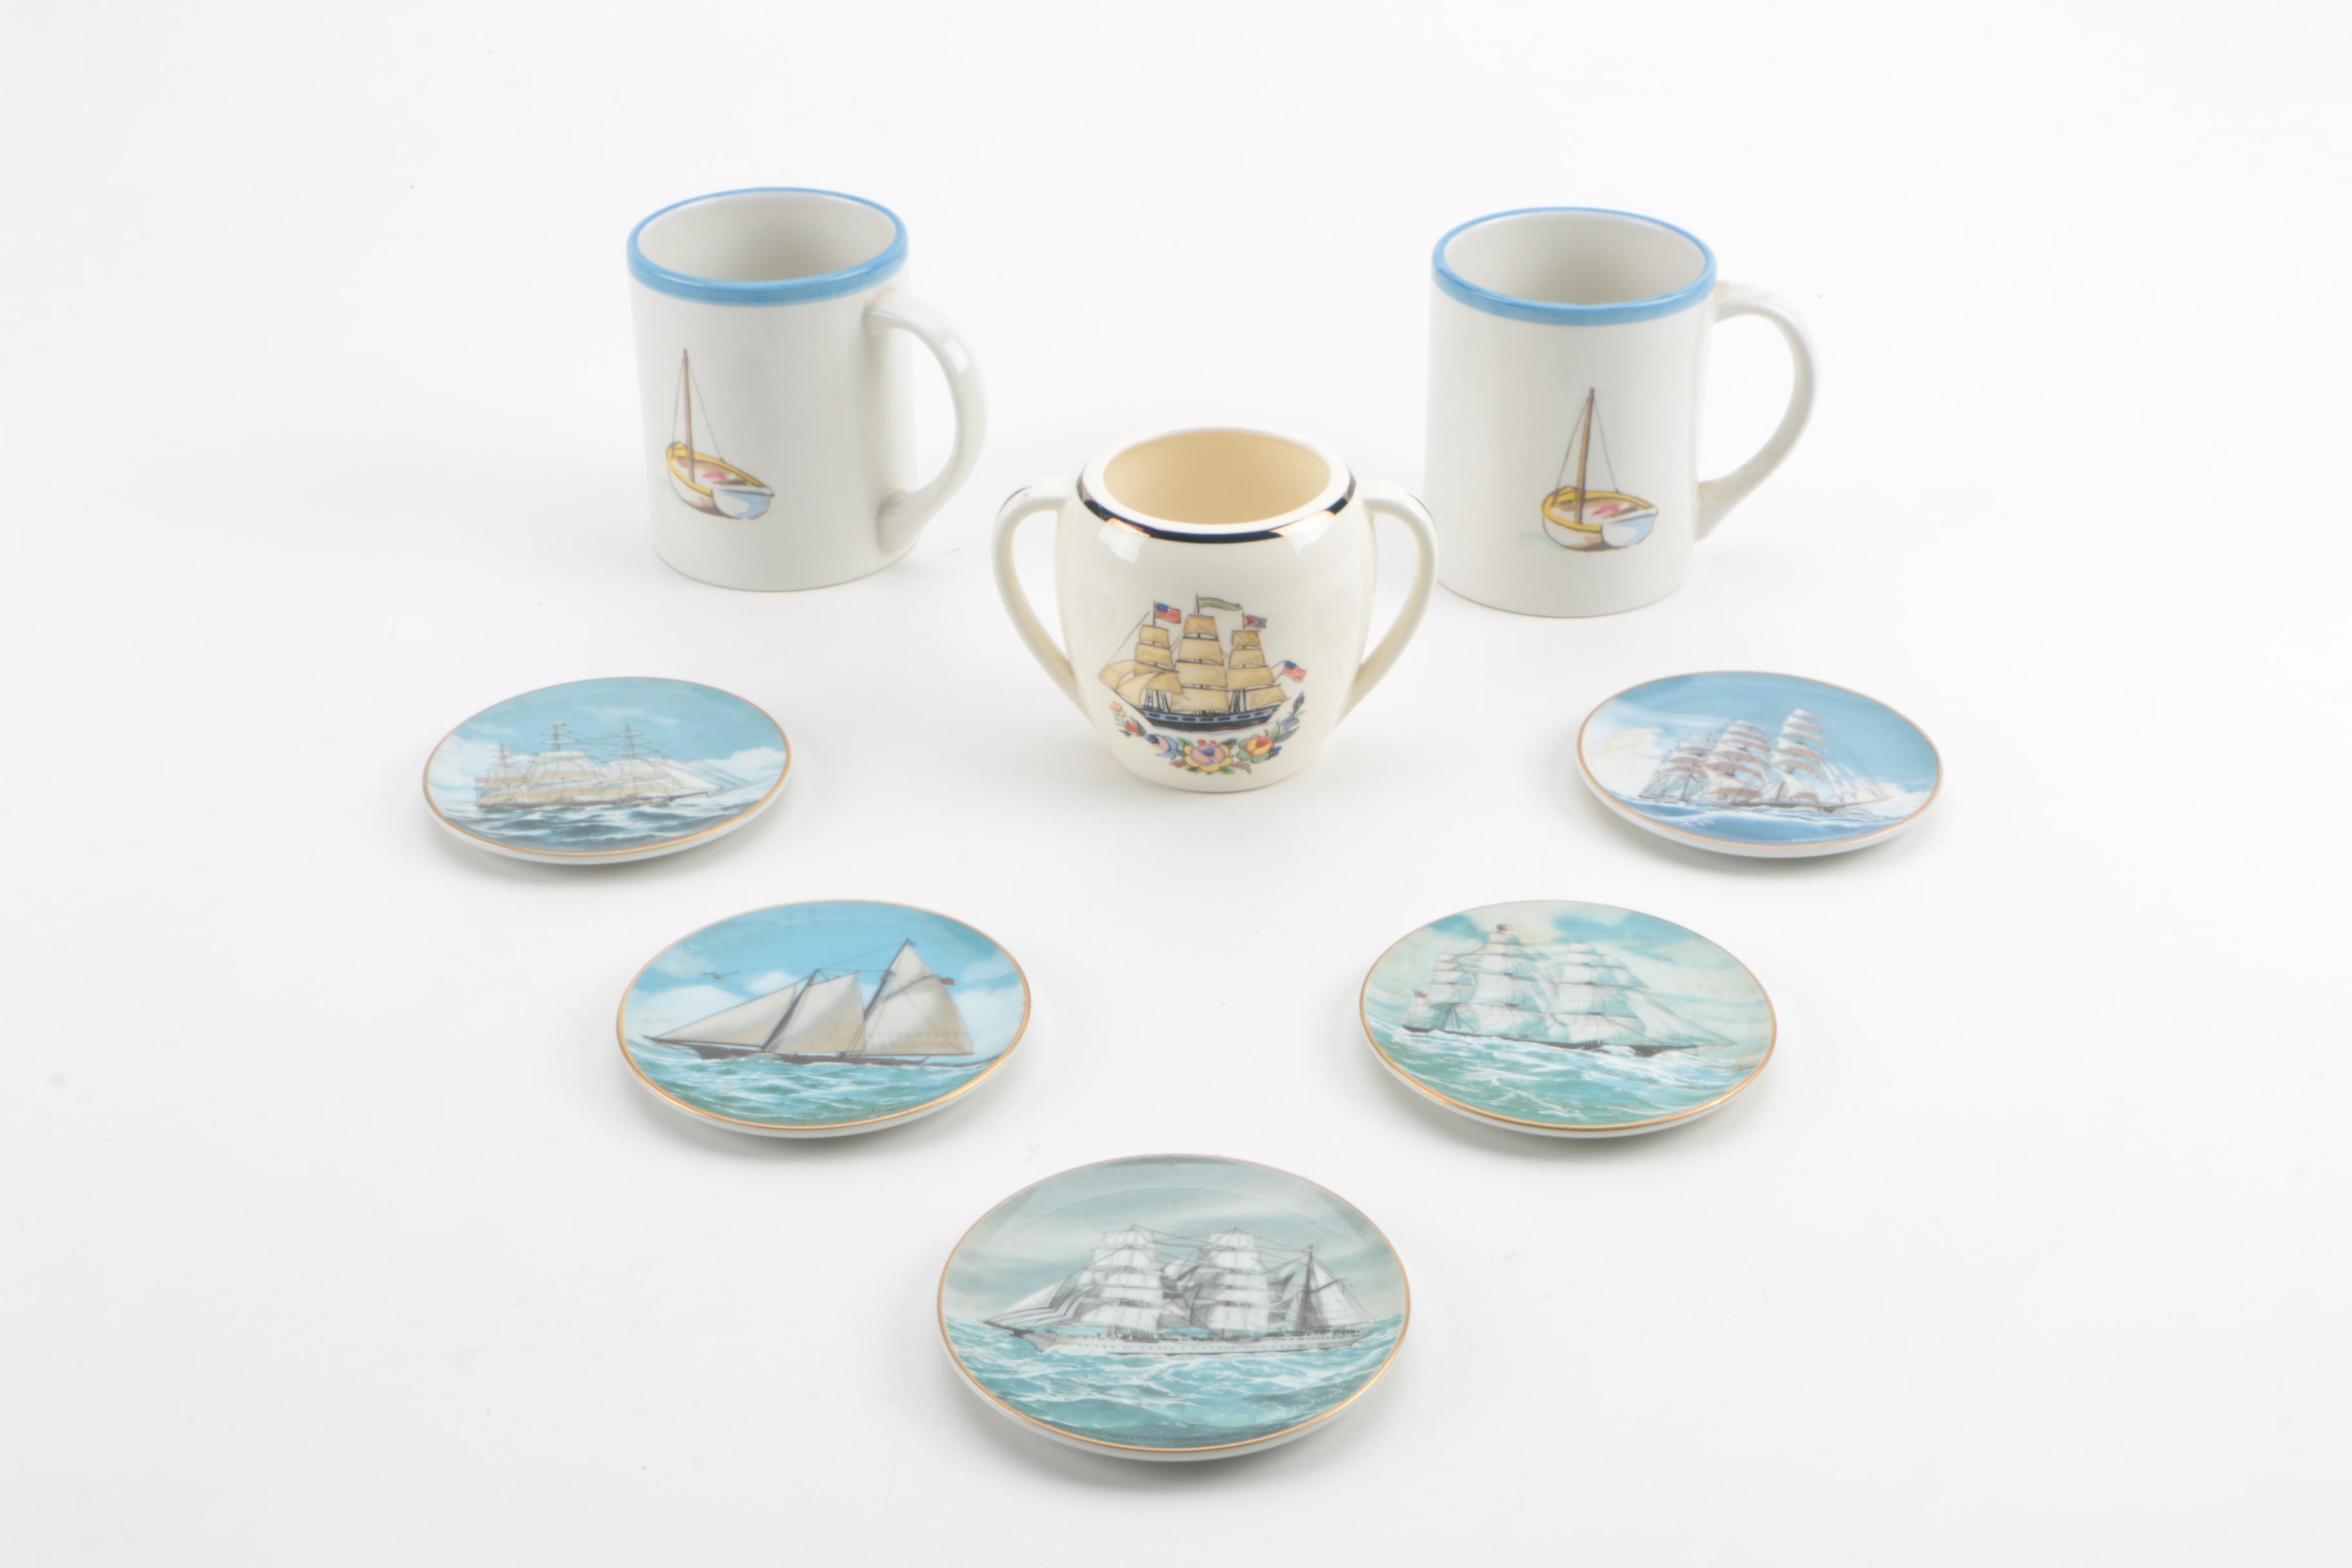 Nautical Themed Tableware Including Danbury Mint ... & Nautical Themed Tableware Including Danbury Mint : EBTH